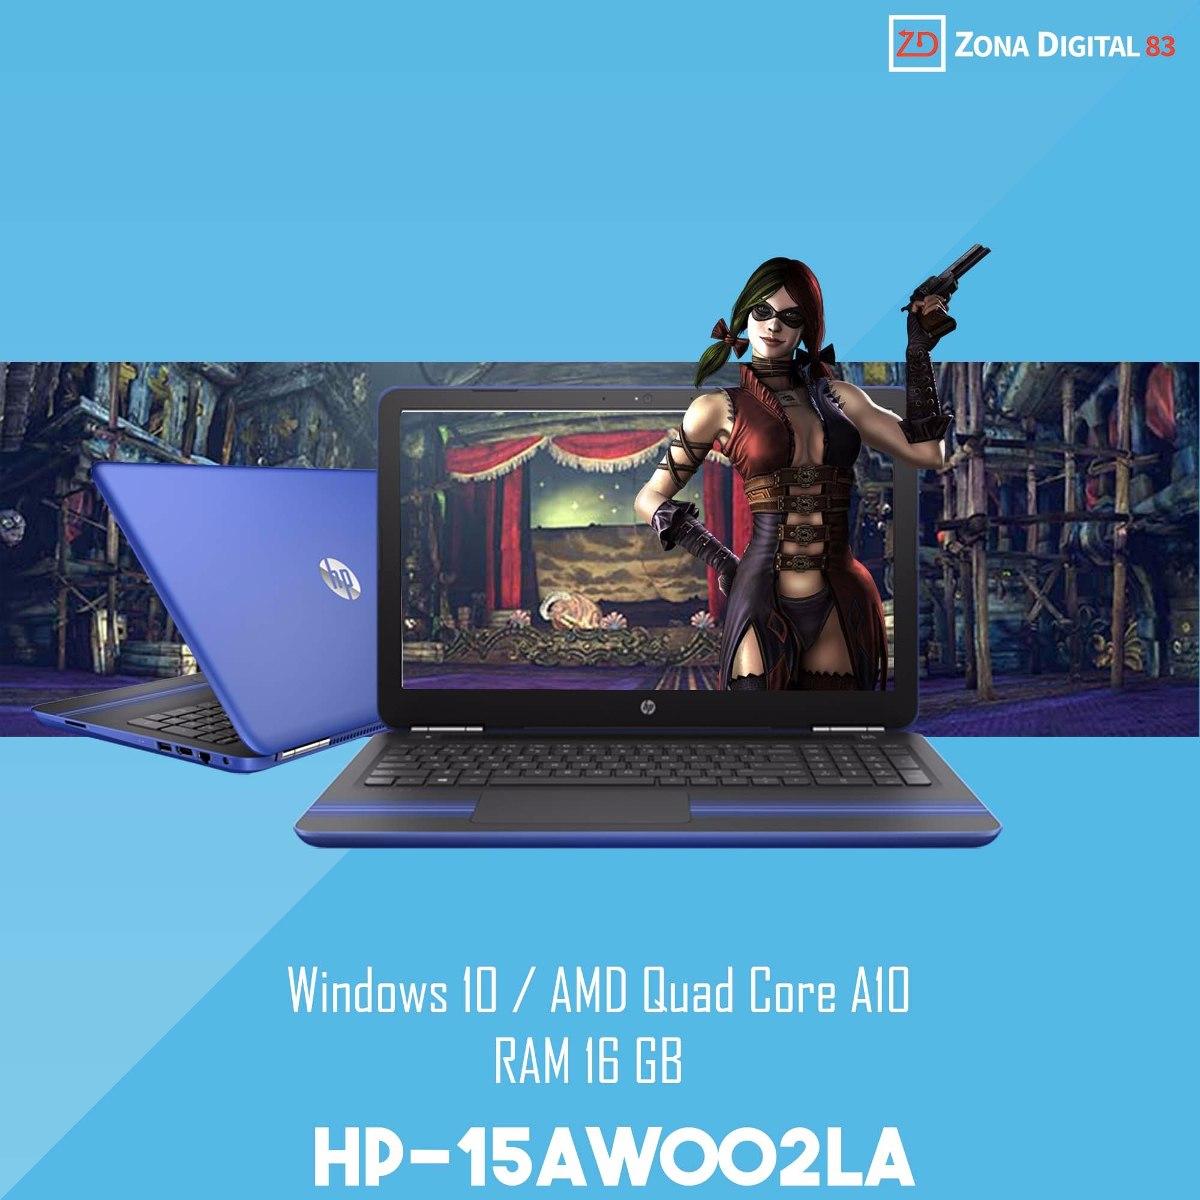 Laptop Hp Amd Quadcore A10 9600p 16gb Ram 33 Ghz